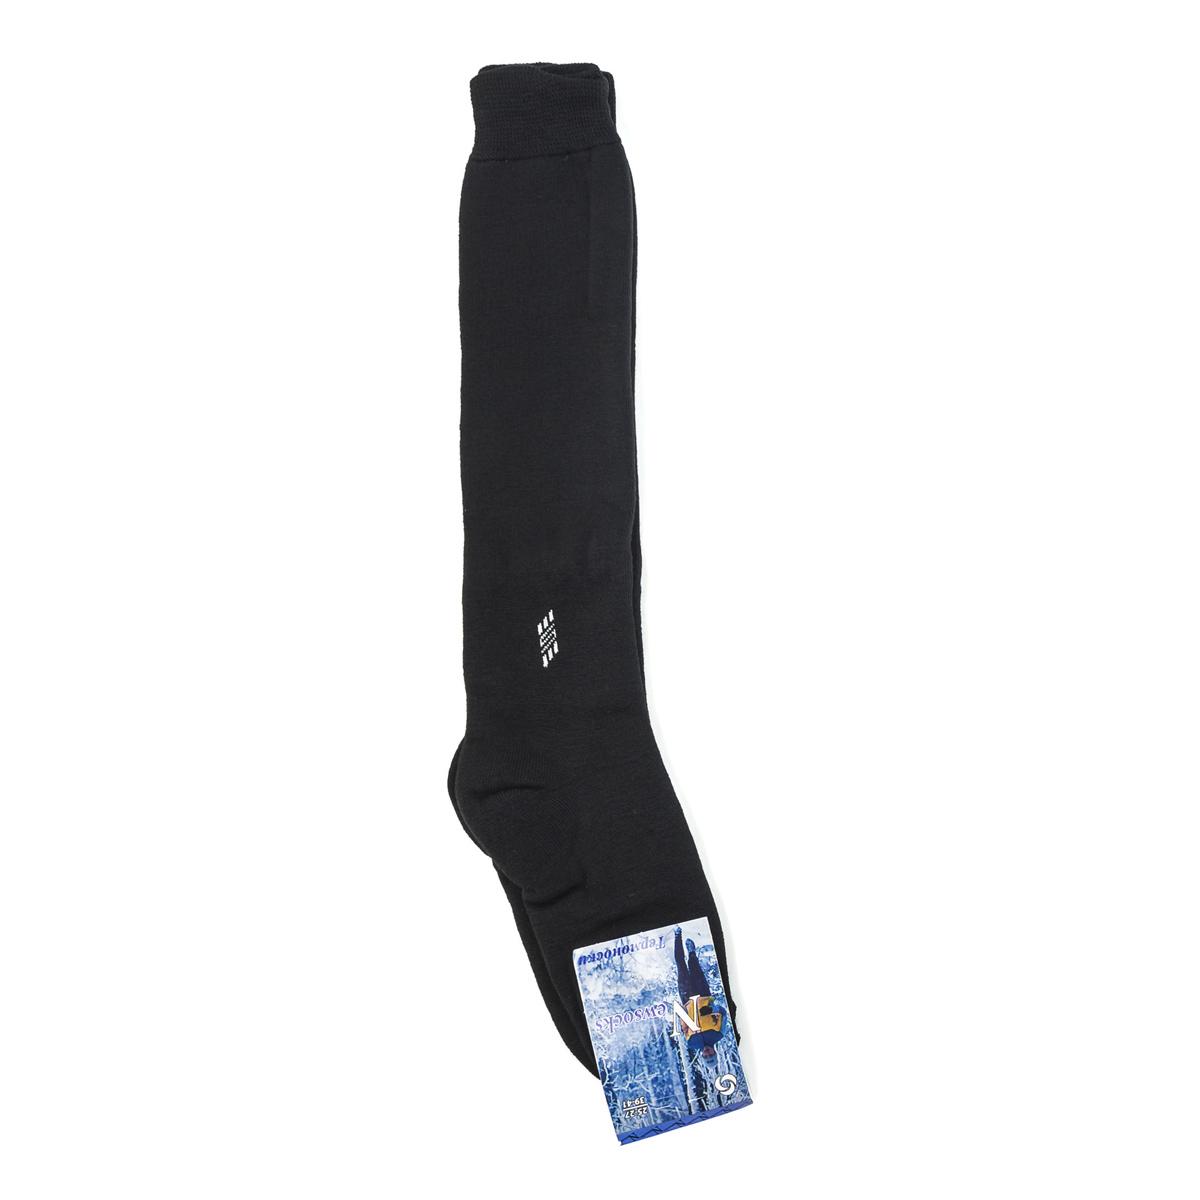 Муж. носки арт. 12-0063 р. 39-41  муж носки арт 12 0008 р 45 46